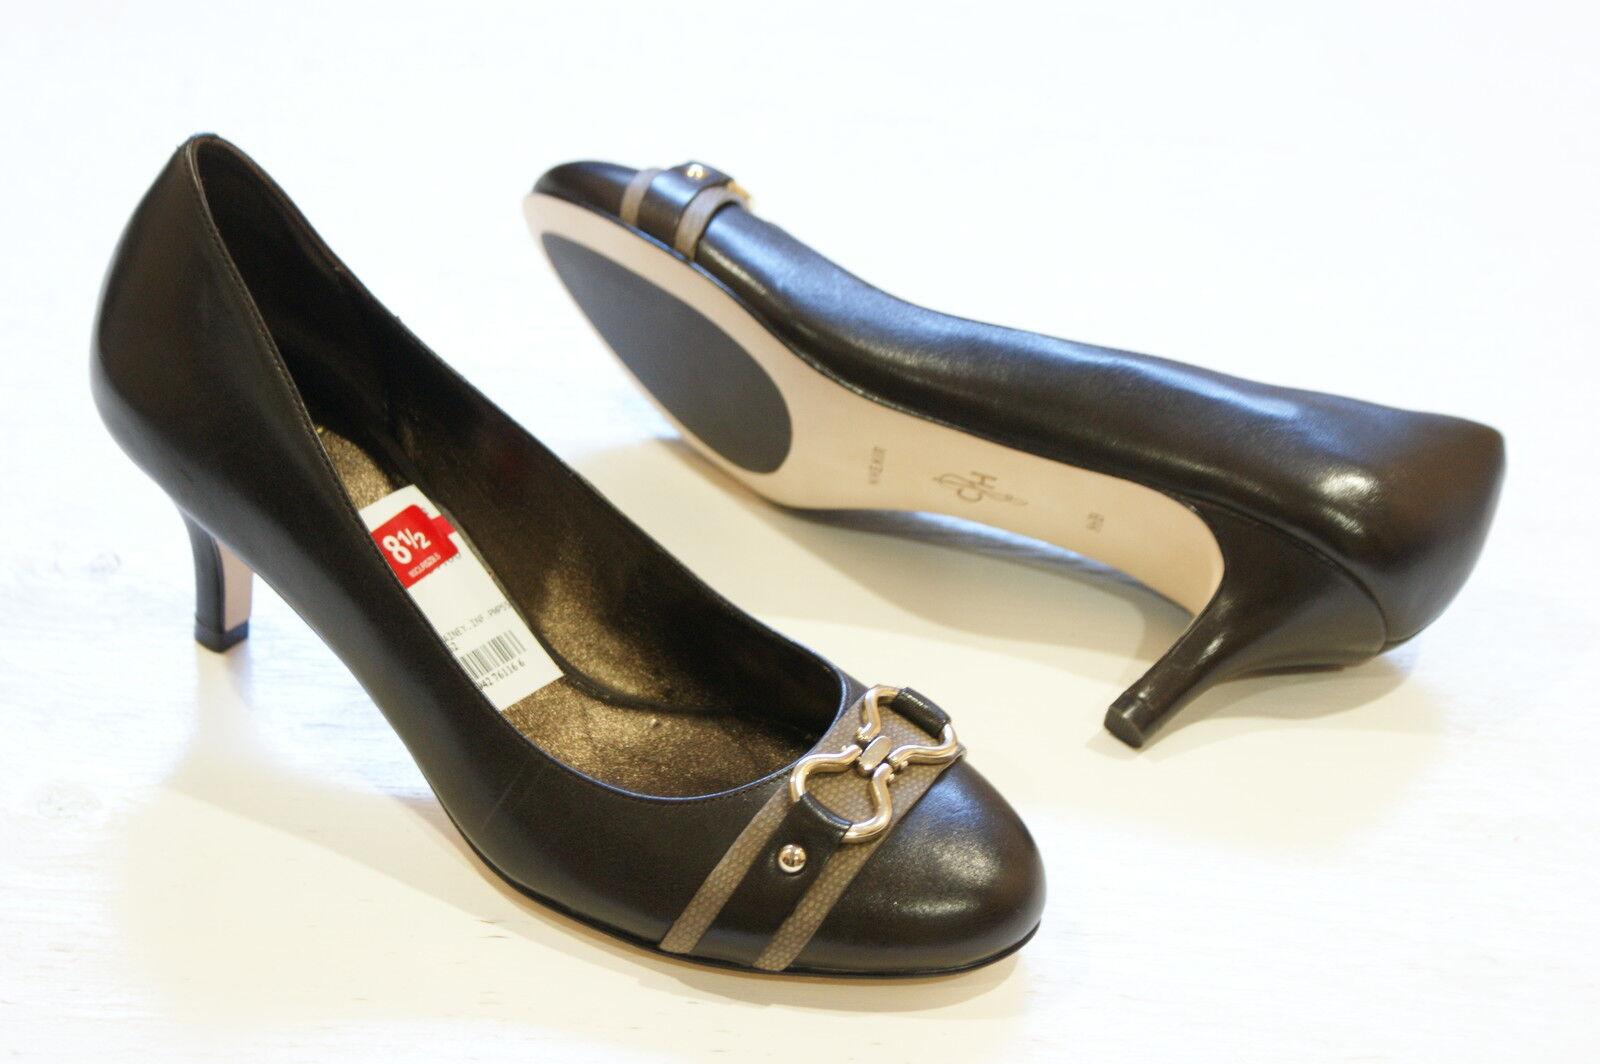 Cole Haan AIR LAINEY Chocolate Leder Pump Heels Schuhes Damenschuhe 9.5 NEW IN BOX